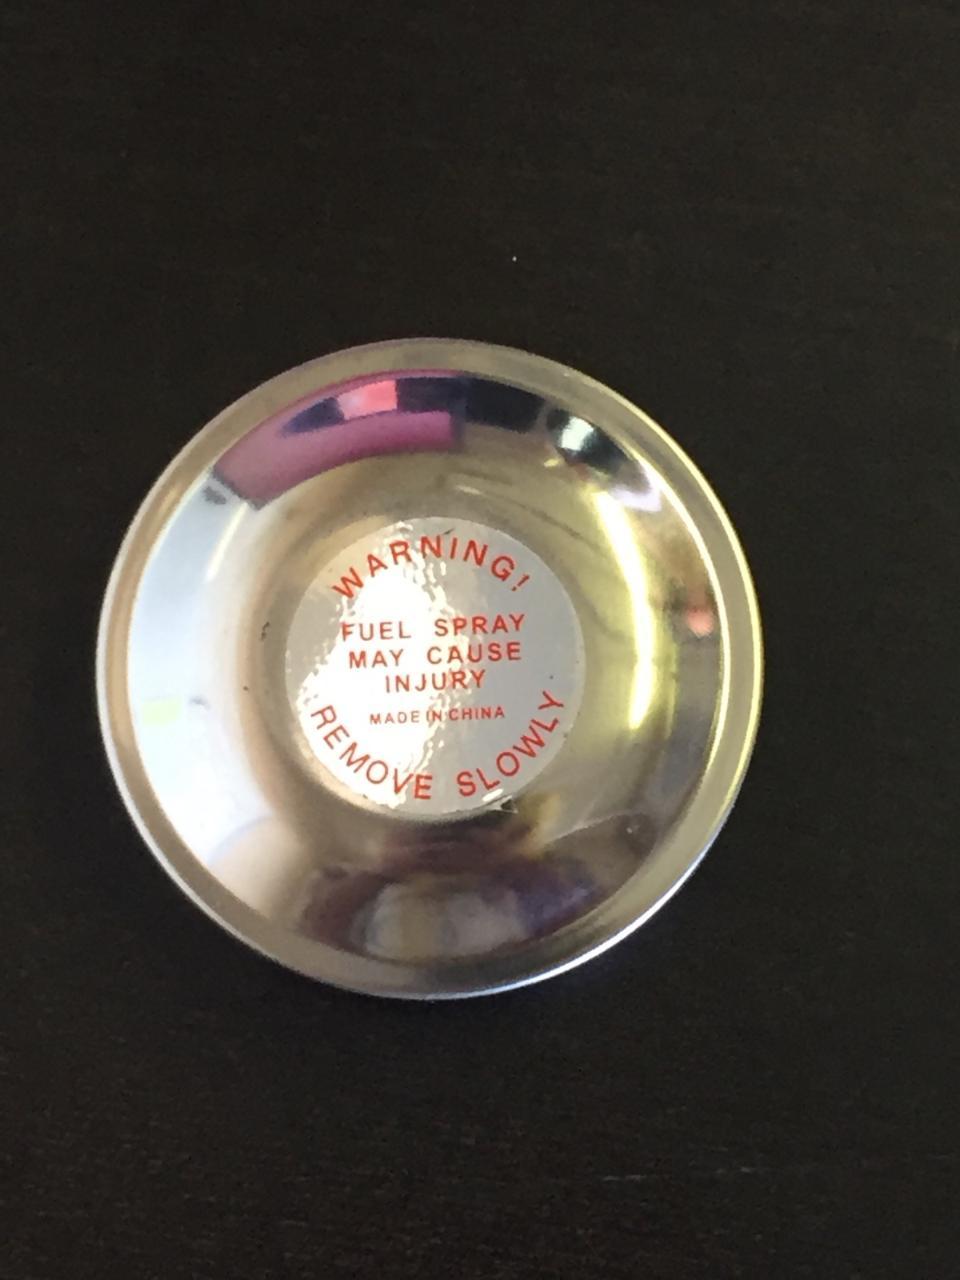 GAS CAP CASE, OLIVER - 550, 770, 880, 1600, 1650, 1750, 1800, 1850, 1900, 1950 Diesel